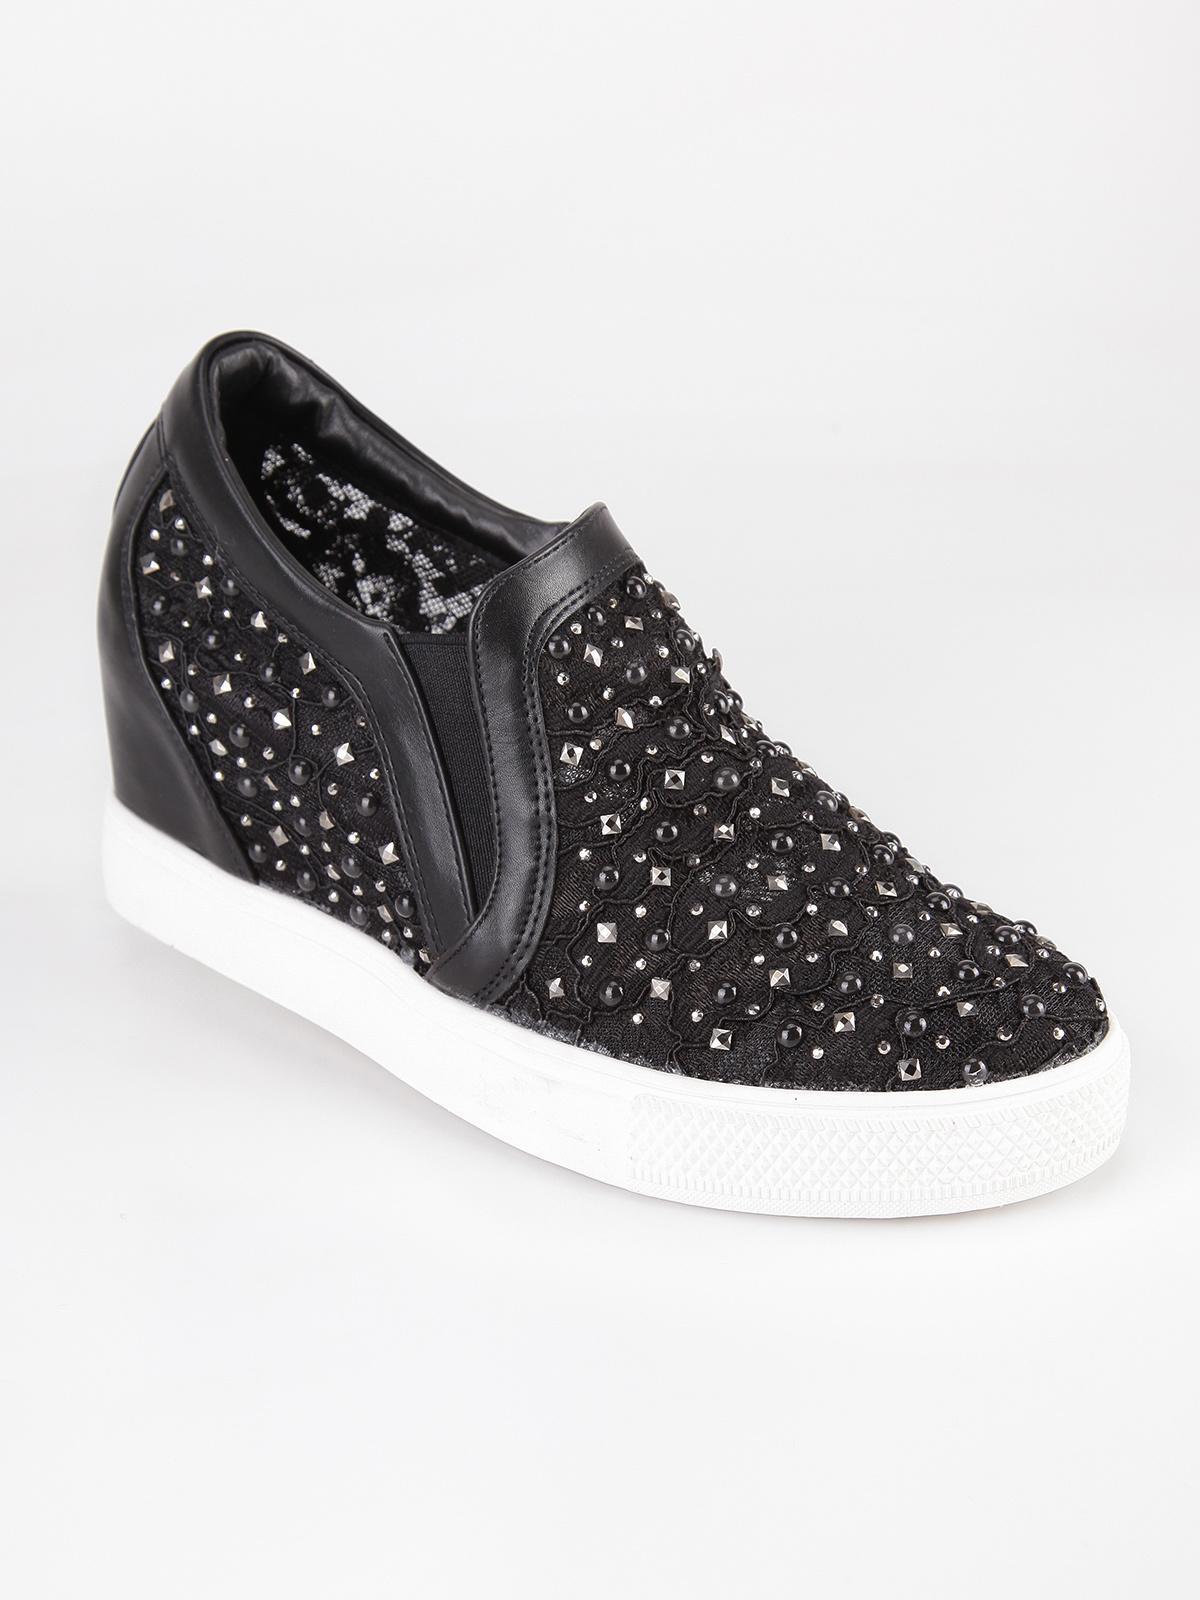 0c7a3ed82f Sneakers in pizzo con zeppa interna janessa | MecShopping